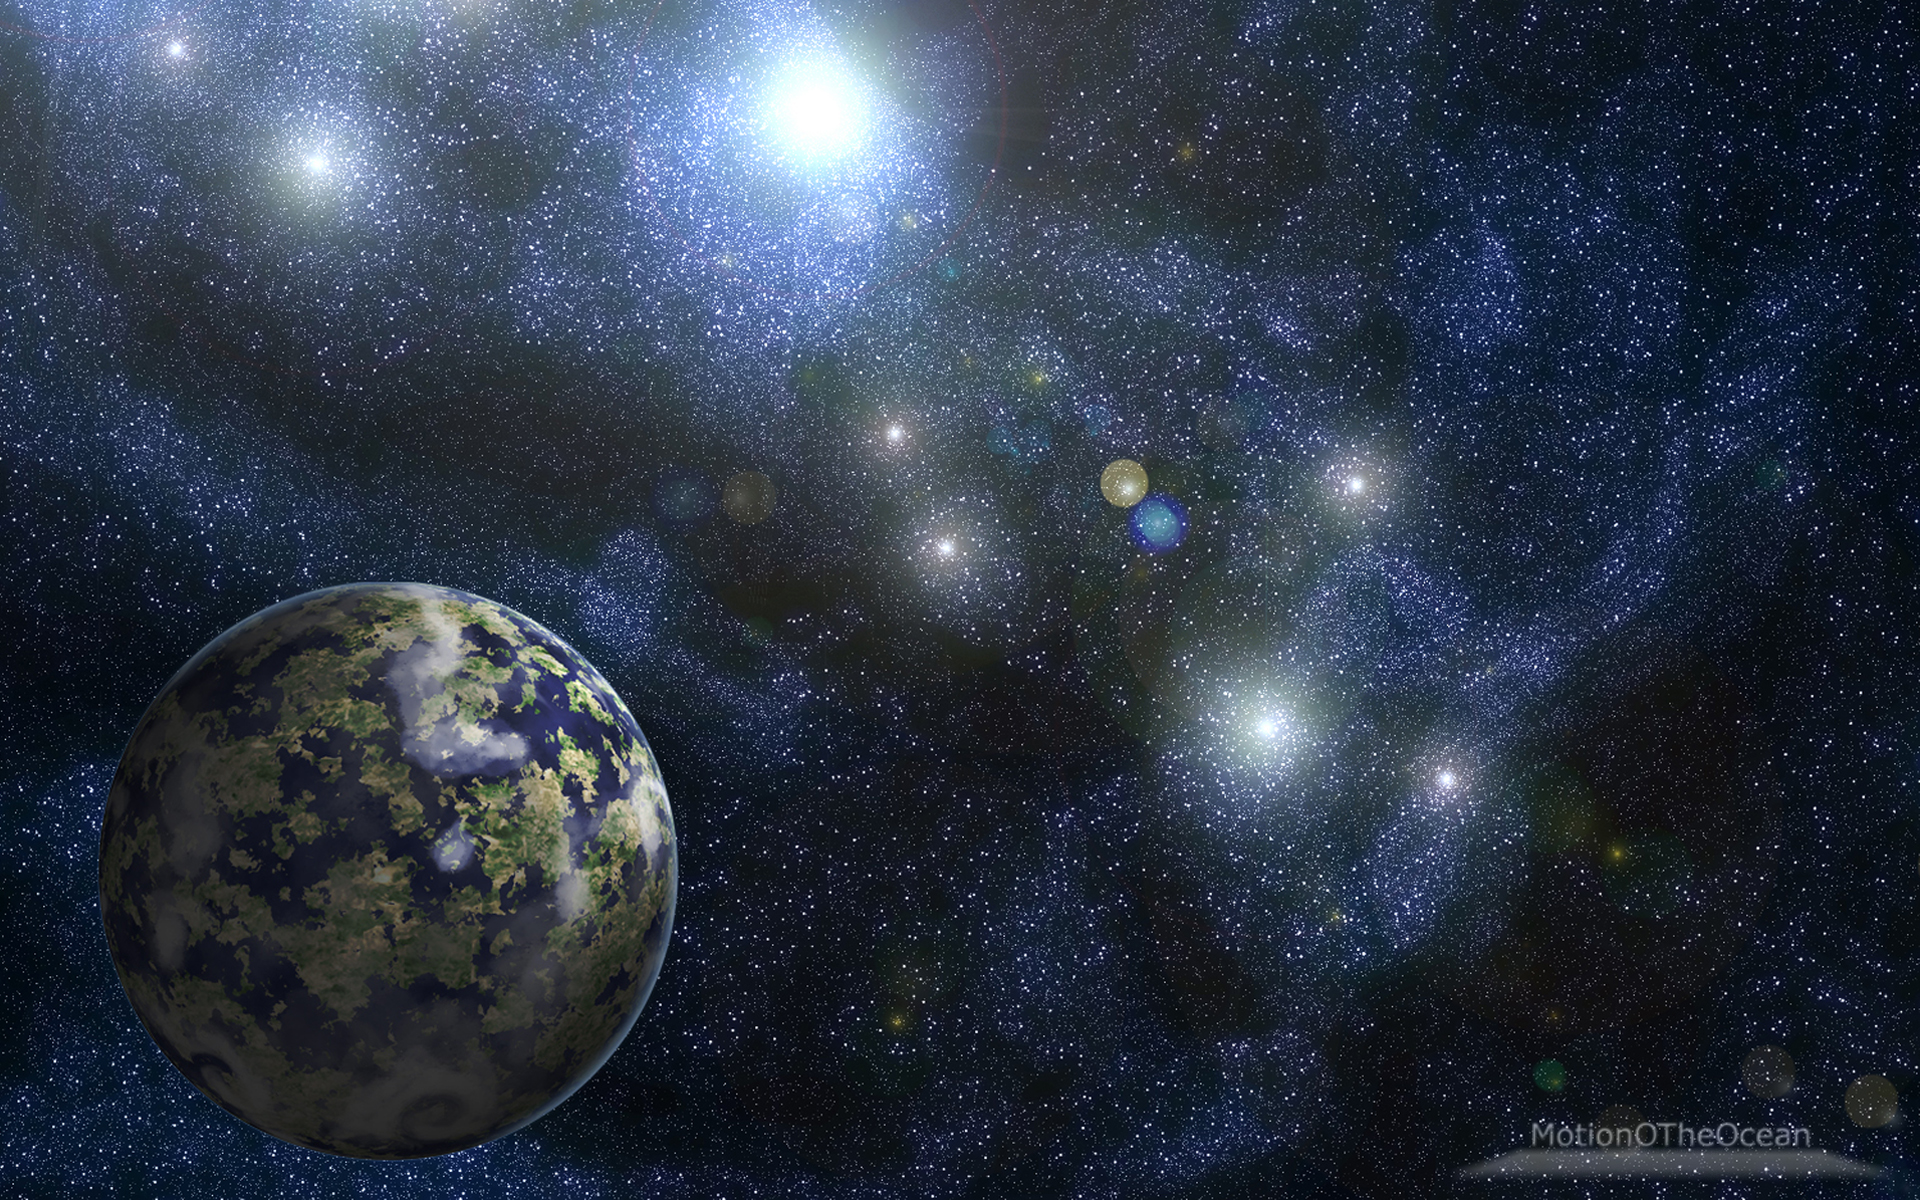 Planet&ampCluster By MotionOTheOcean  Desktop Wallpaper